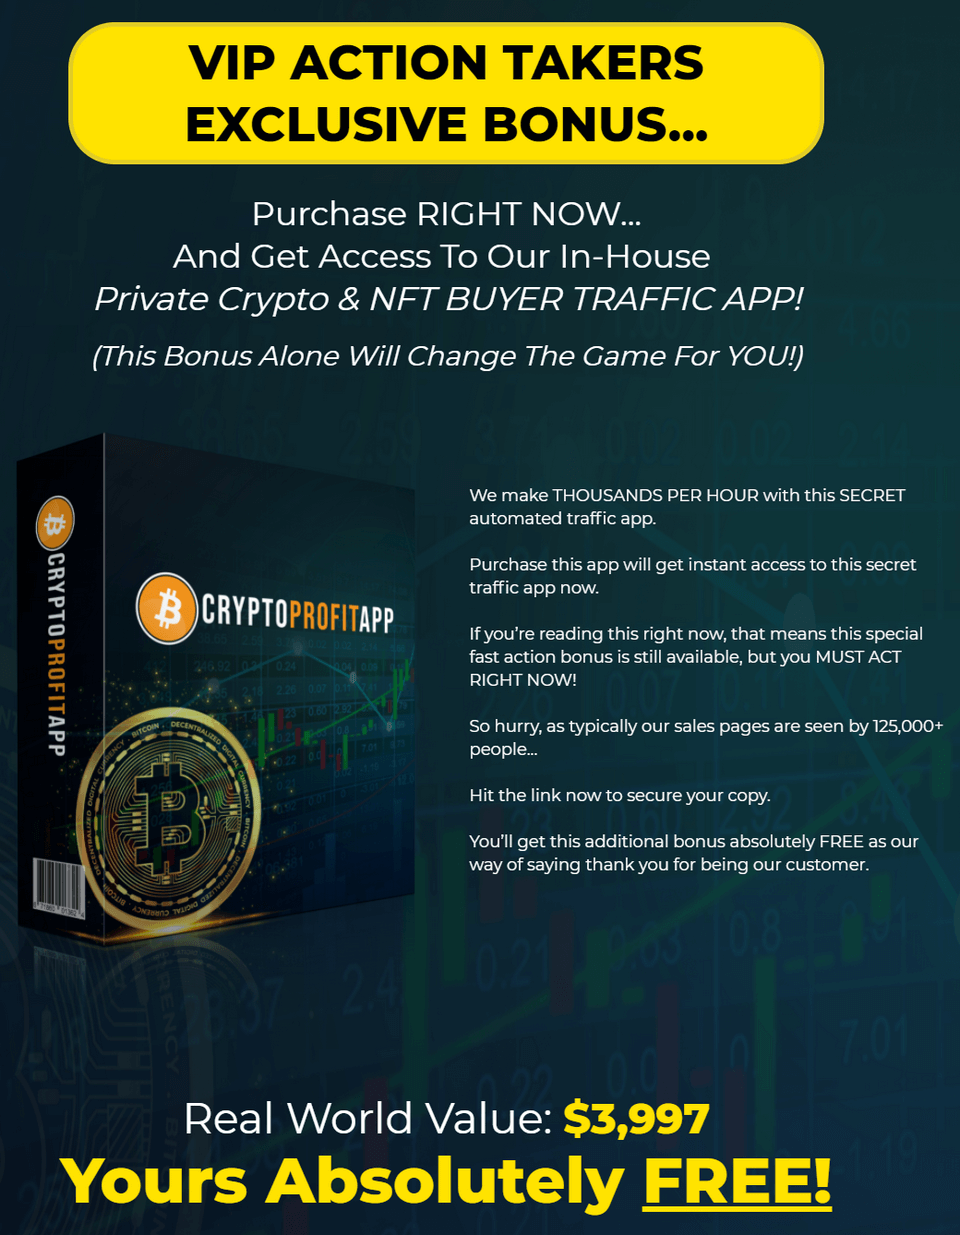 Crypto-Profit-App-bonus-2